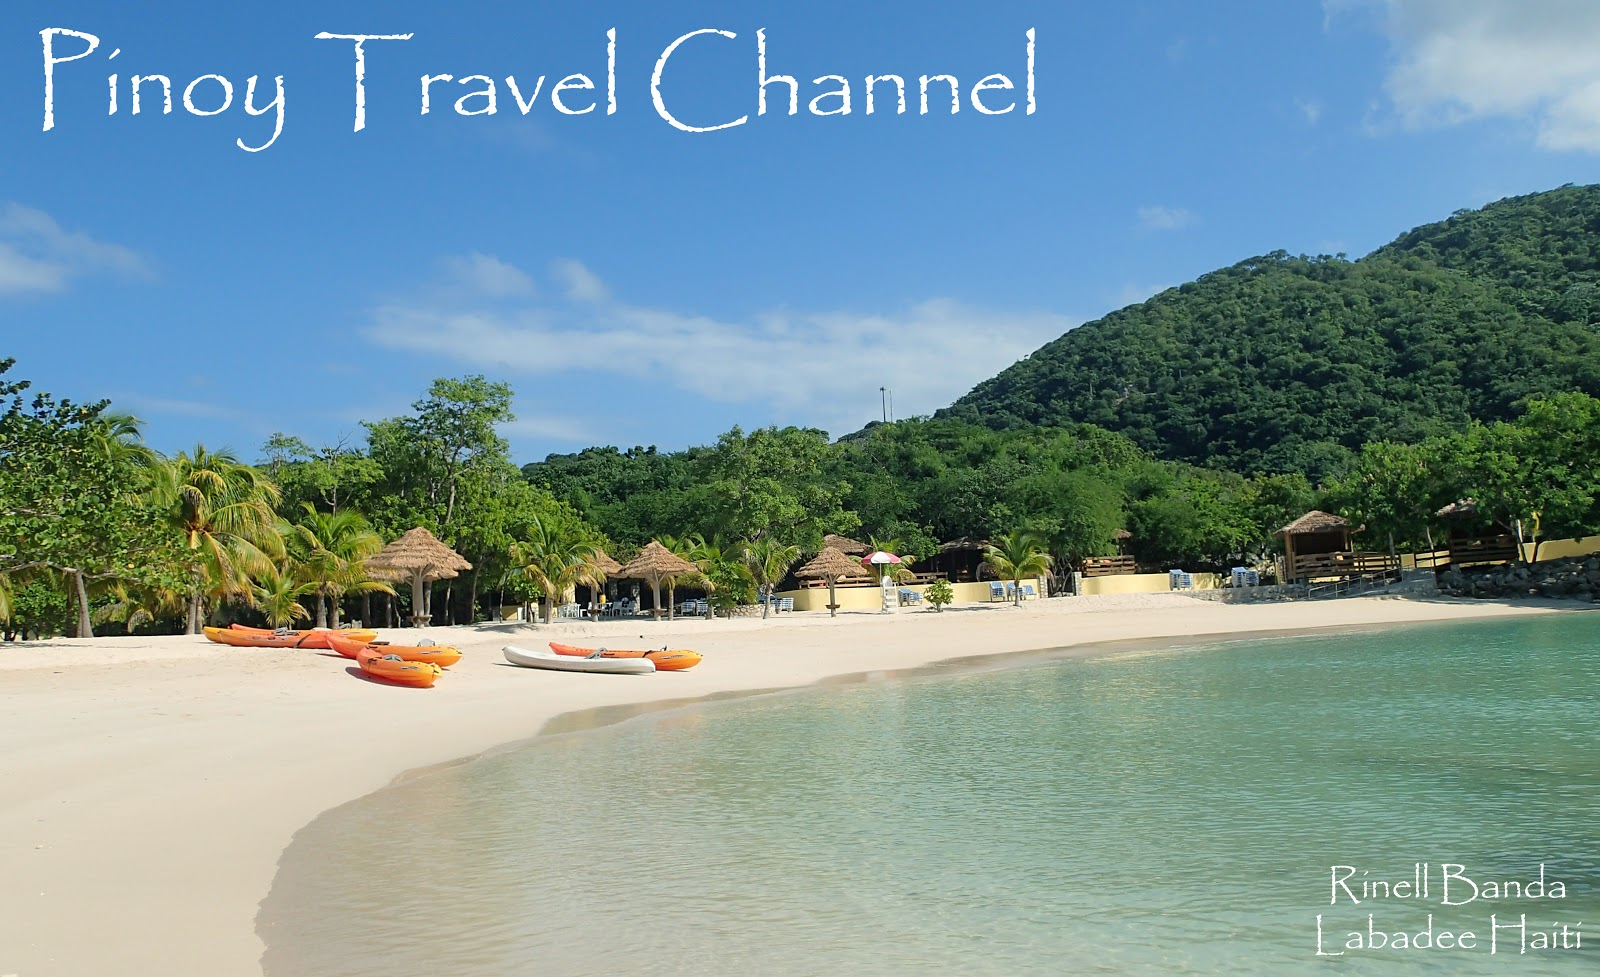 pin images of labadee haiti beaches wallpaper on pinterest